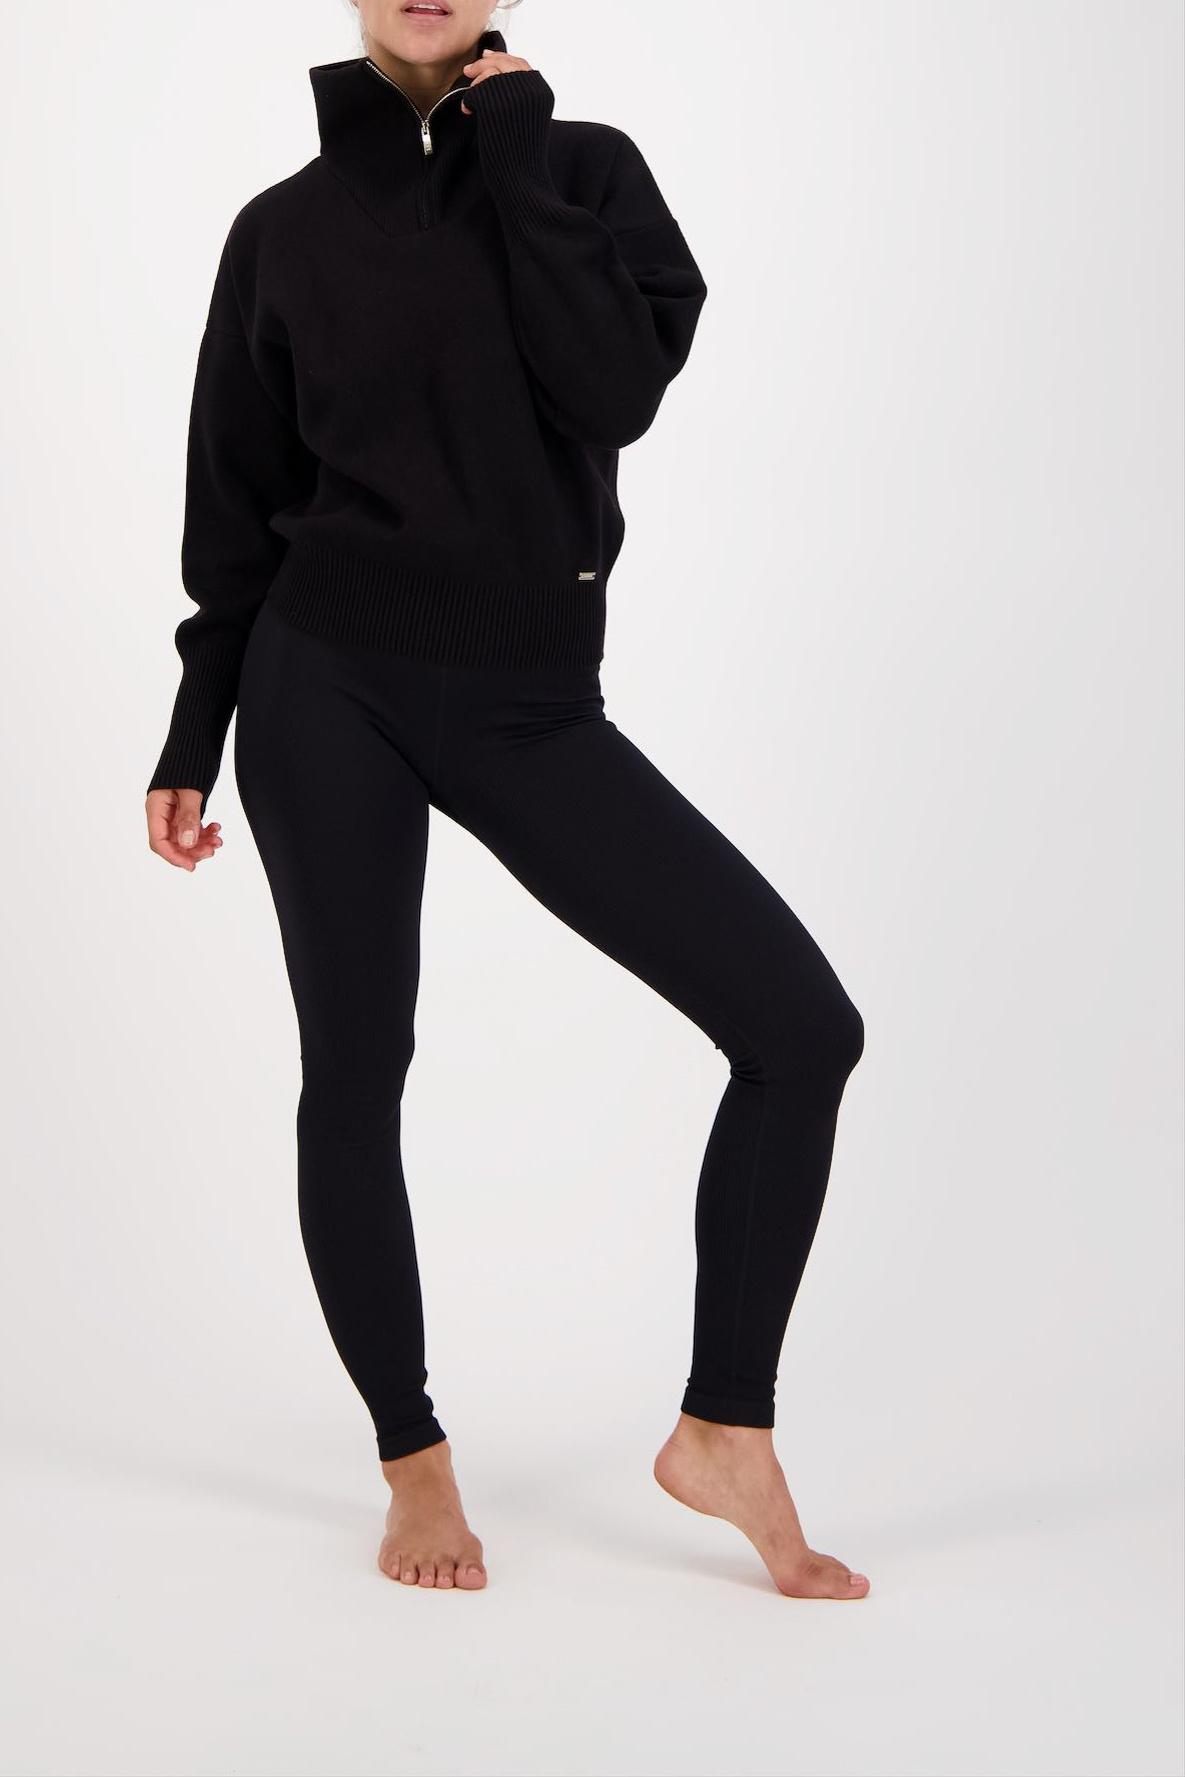 Olly Half-Zip Knit Sweater - Black-6